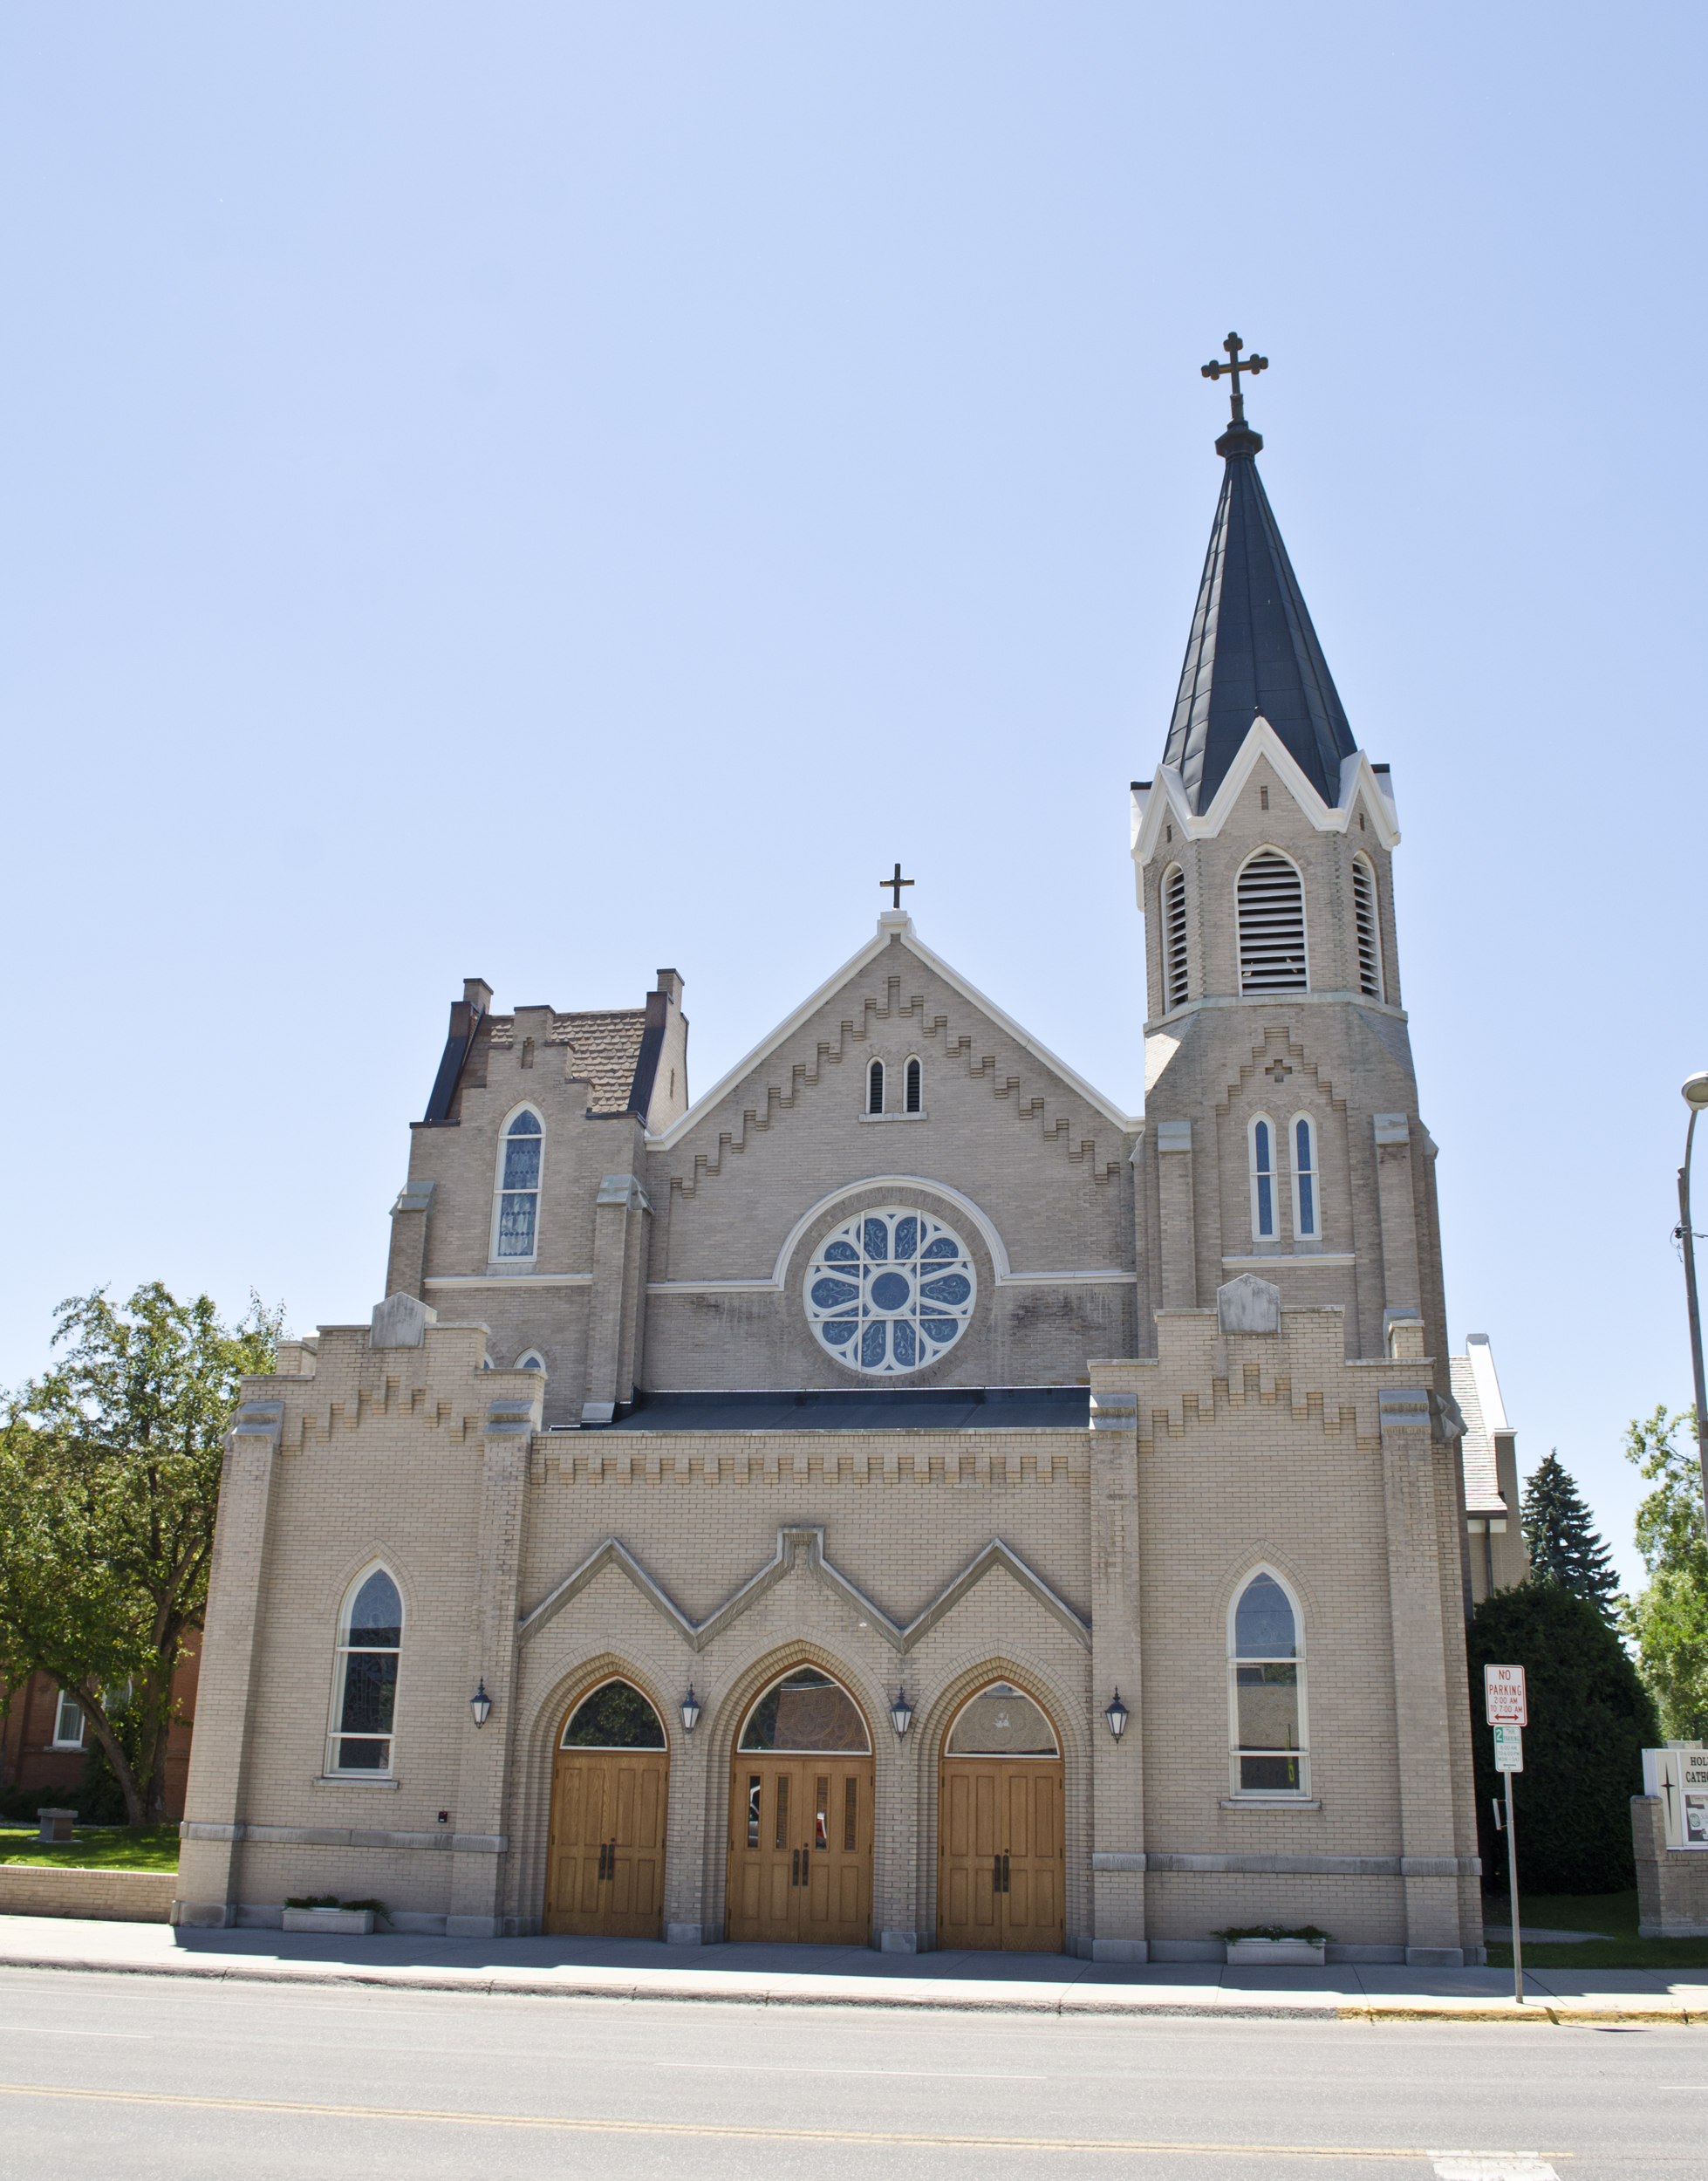 looking S at Holy Rosary Church - Bozeman Montana - 2013-070-09